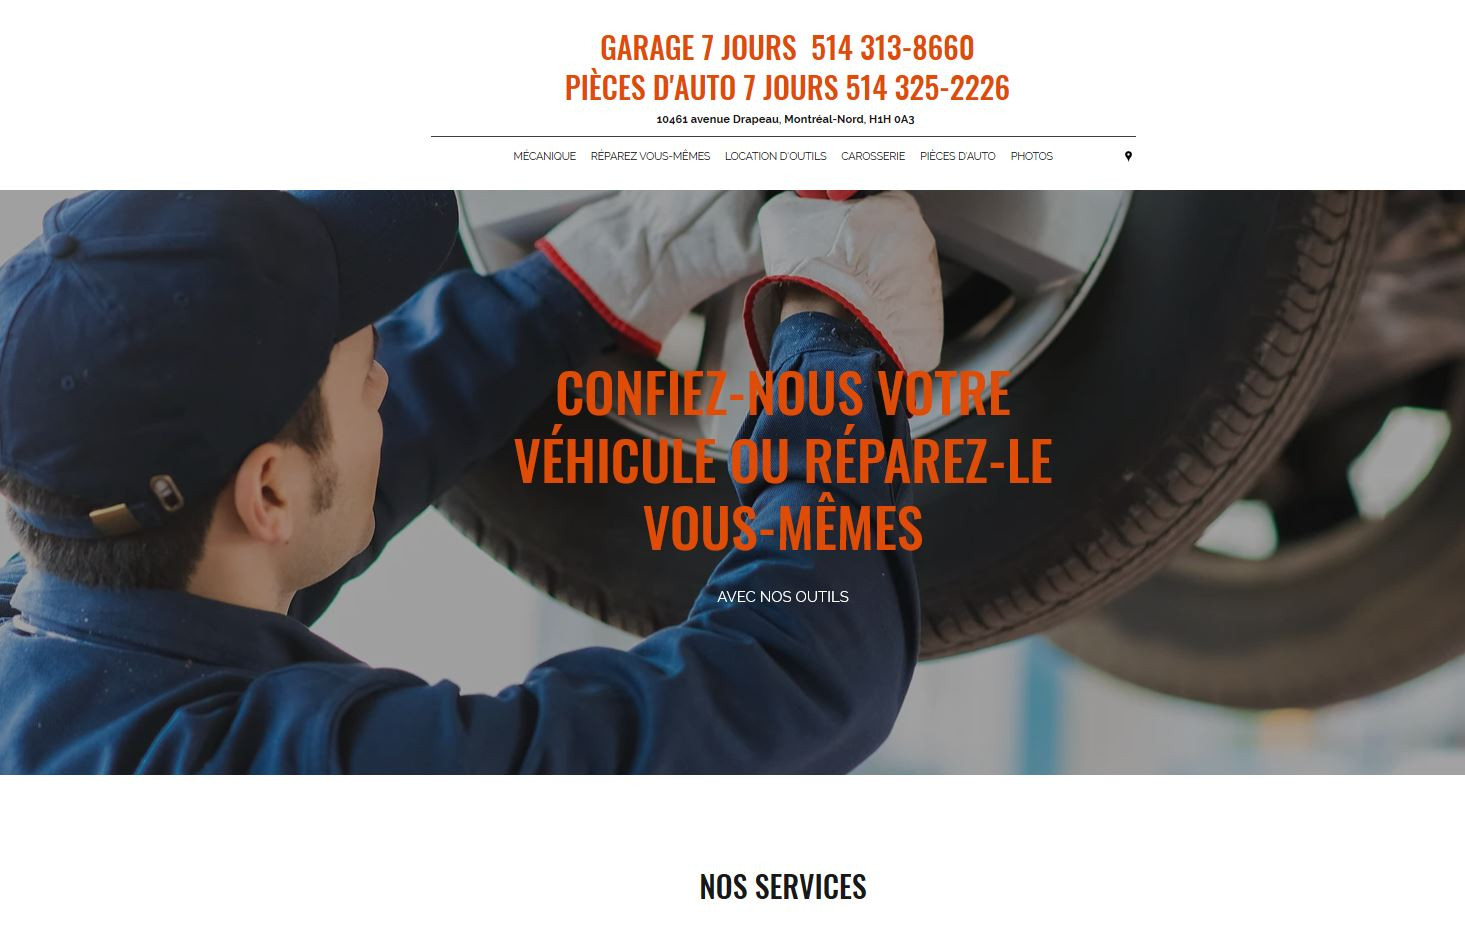 www.garage7jours.com